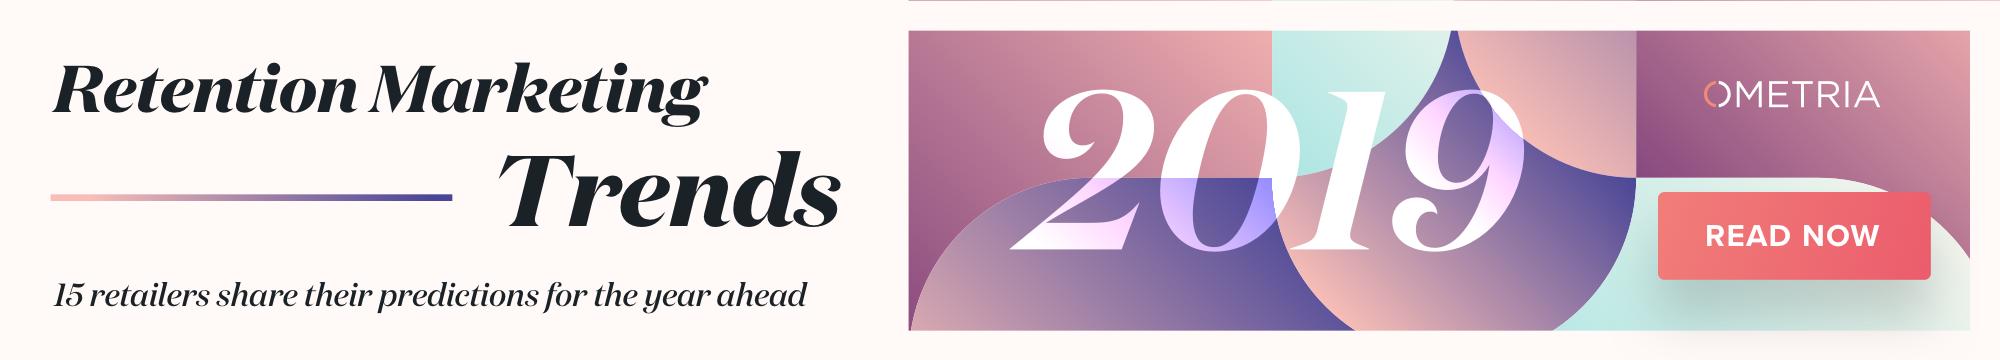 Retention Marketing Trends 2019